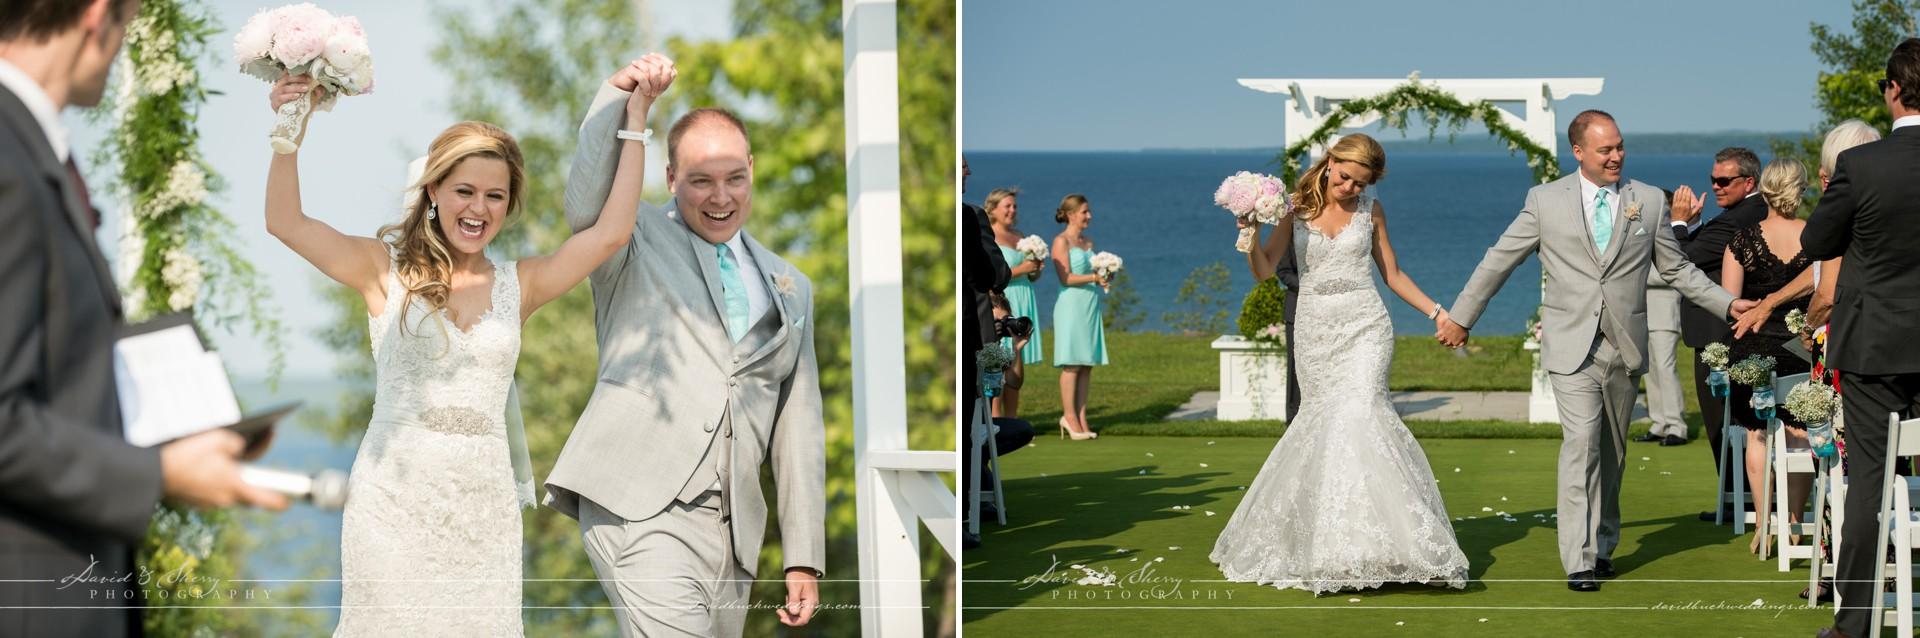 Cobble_Beach_Wedding_Photography_Owen_Sound_28